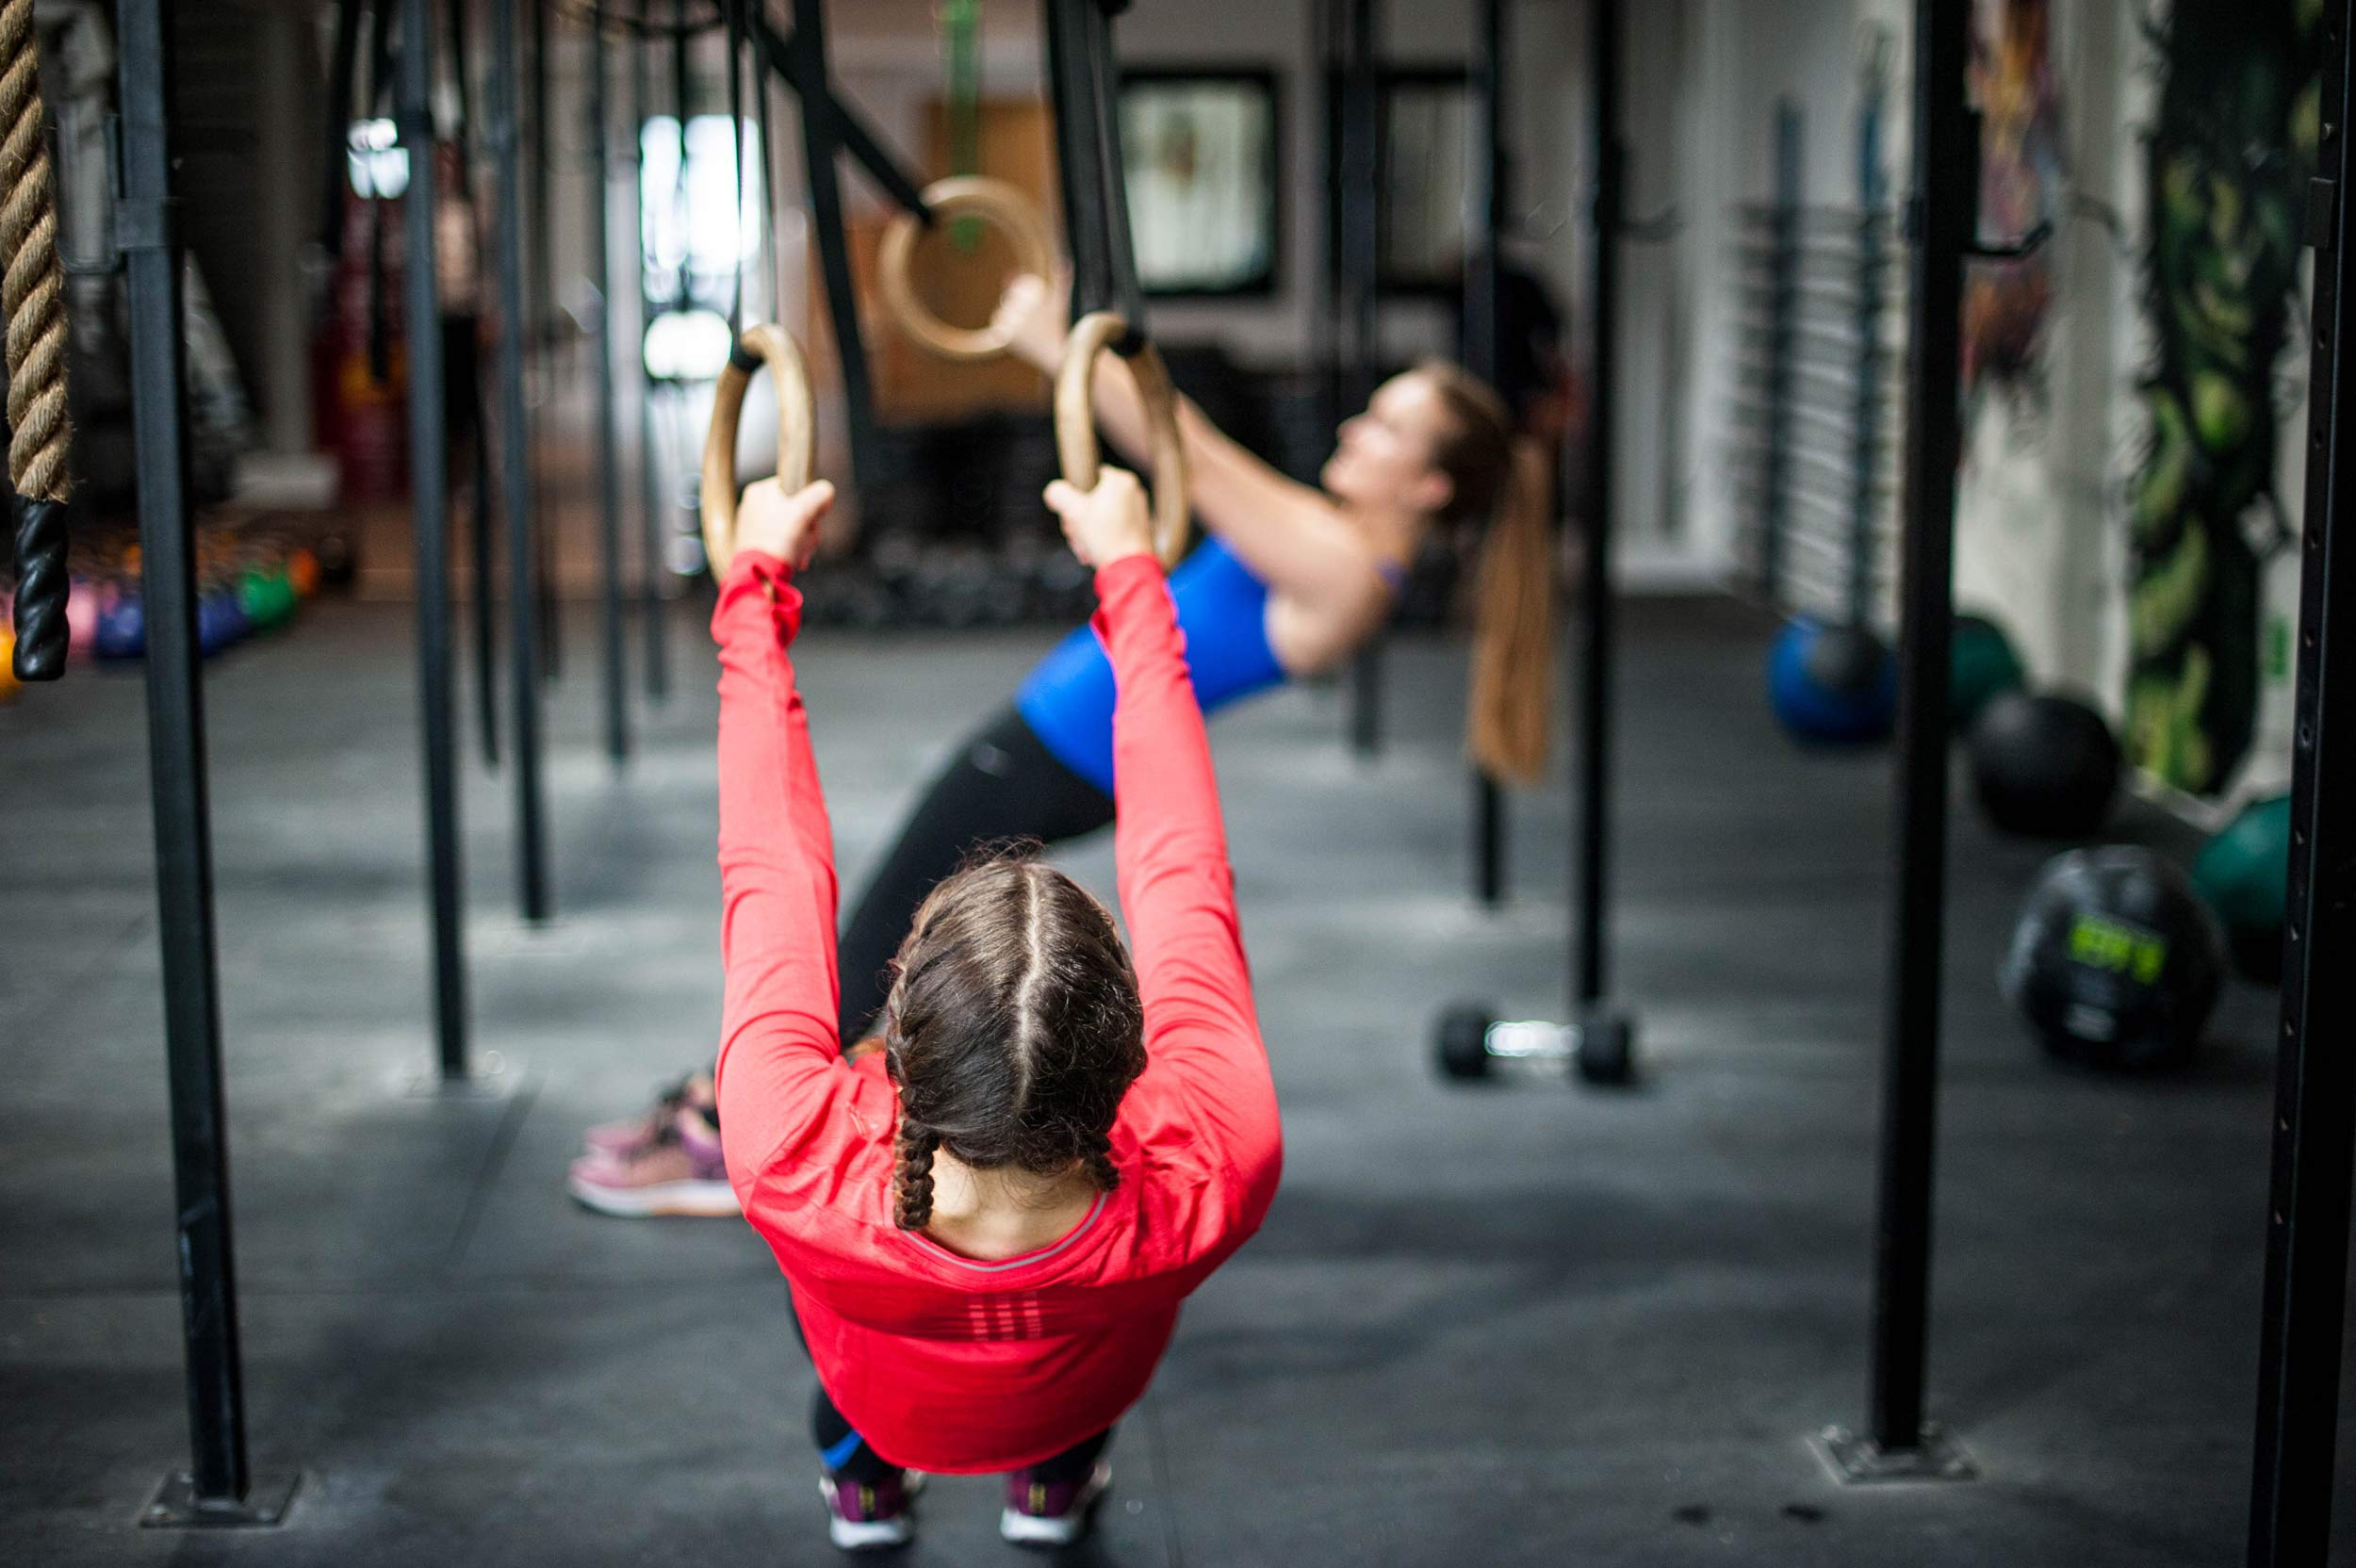 gym-66-cheltenham-strength-conditioning-gymnastic-rings.JPG